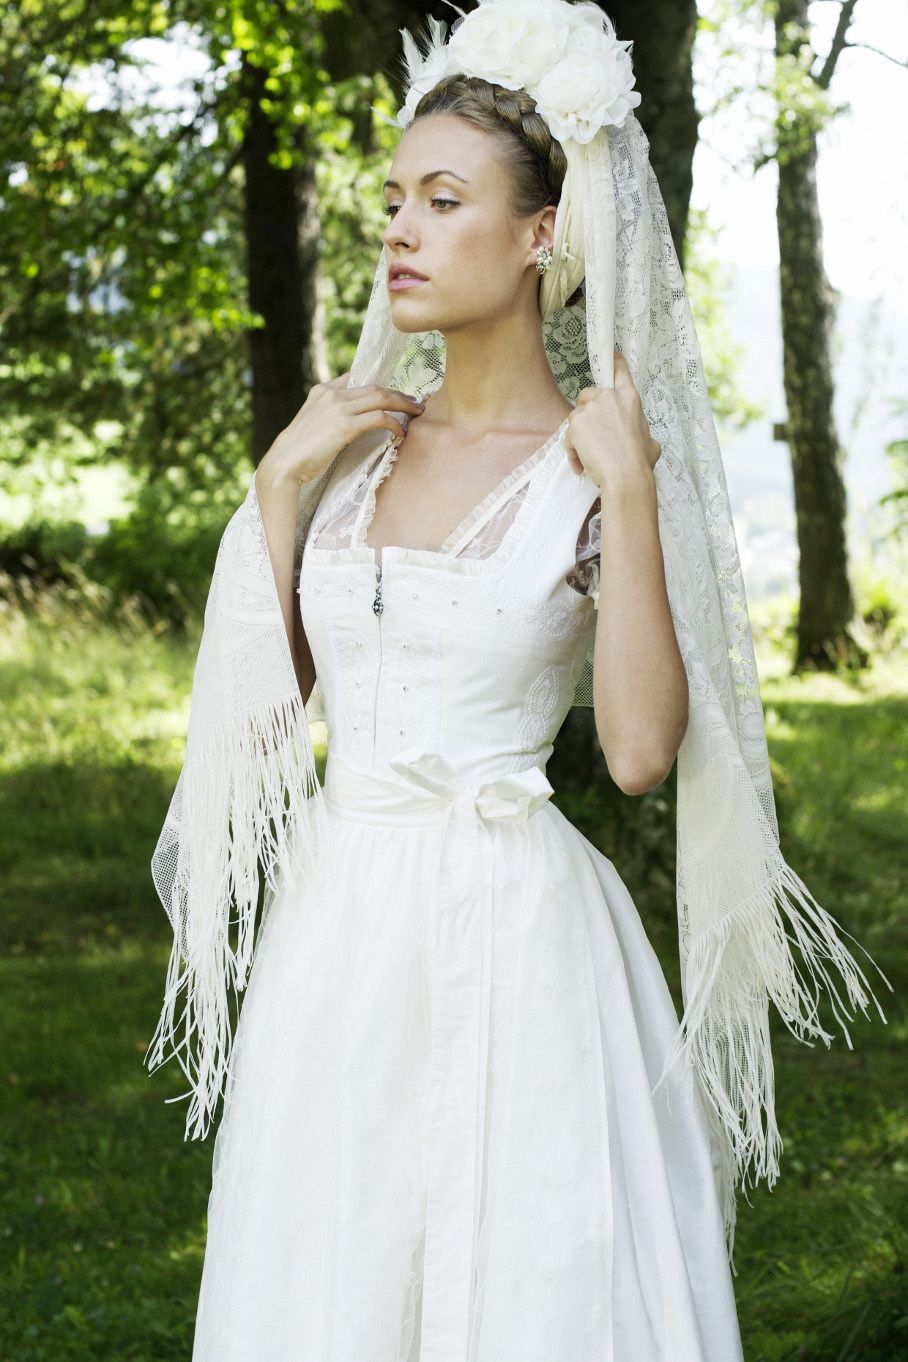 Langes Elgantes Seidenbrautdirndl Wedding Dress Styles Oktoberfest Bridal Style: Wedding Dress German Folk At Reisefeber.org